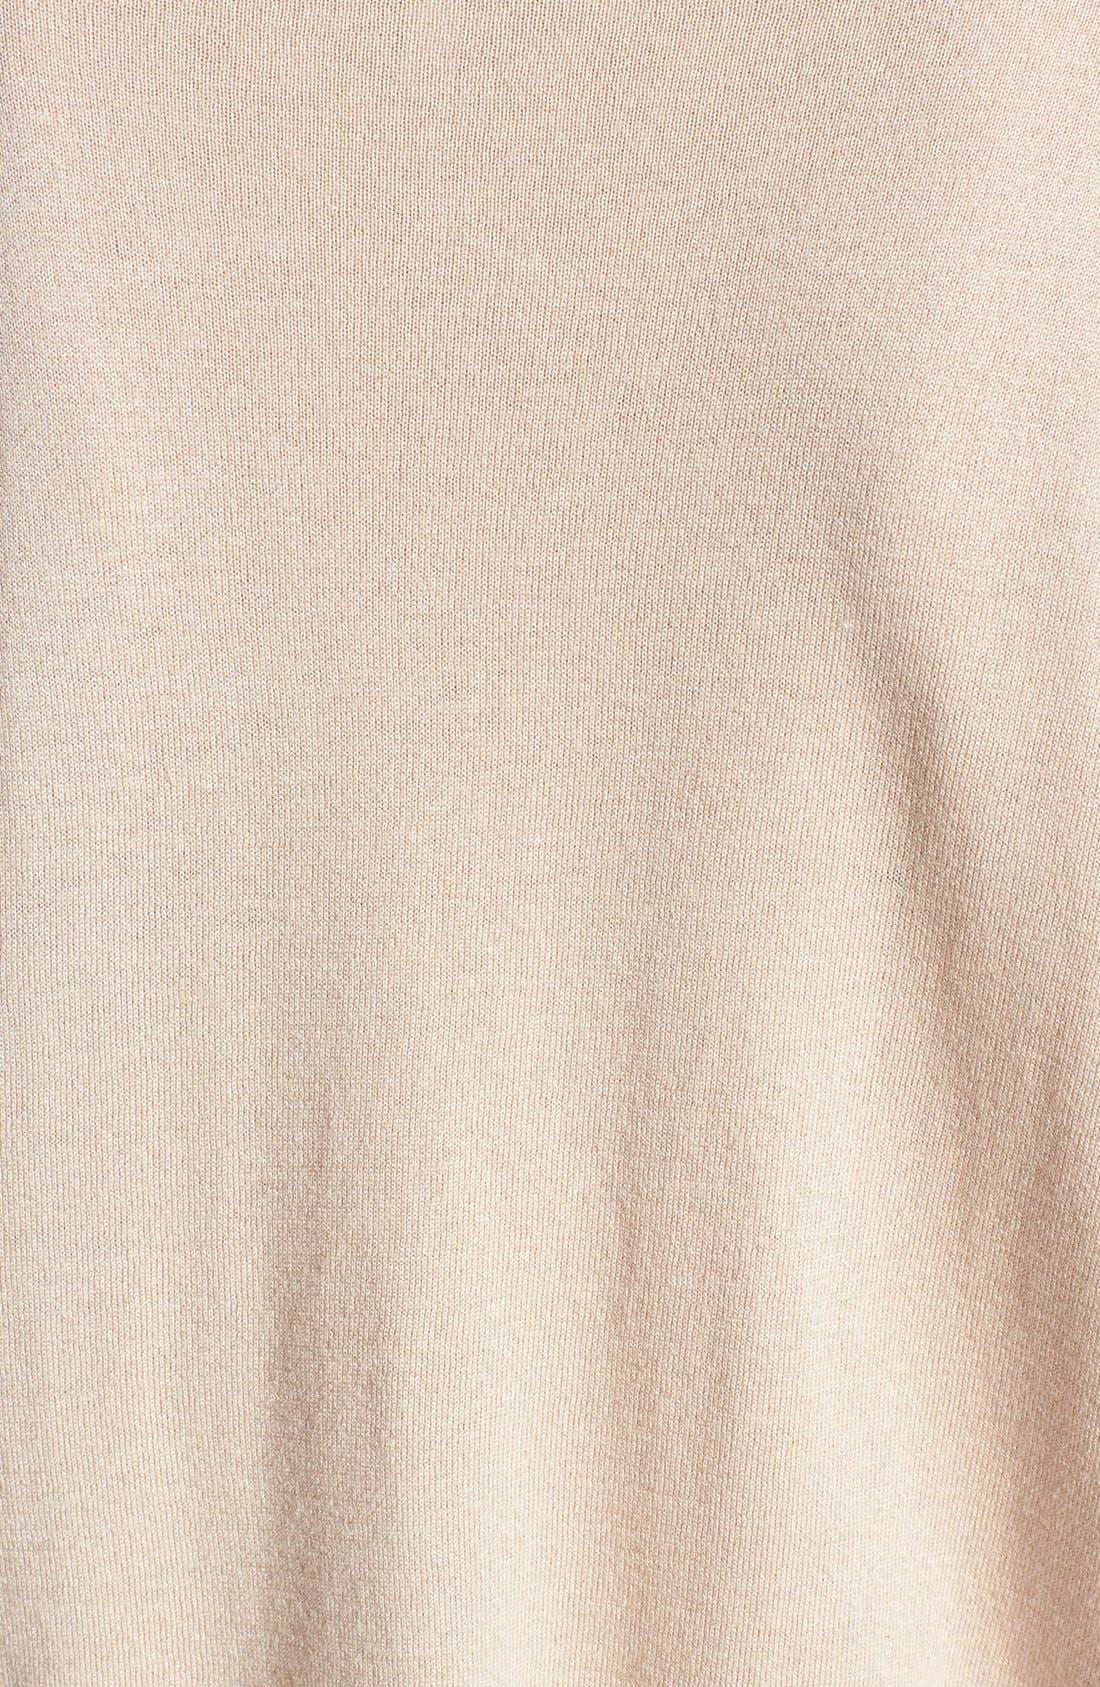 Alternate Image 3  - Joie 'Hilano' Lace Trim Sweater